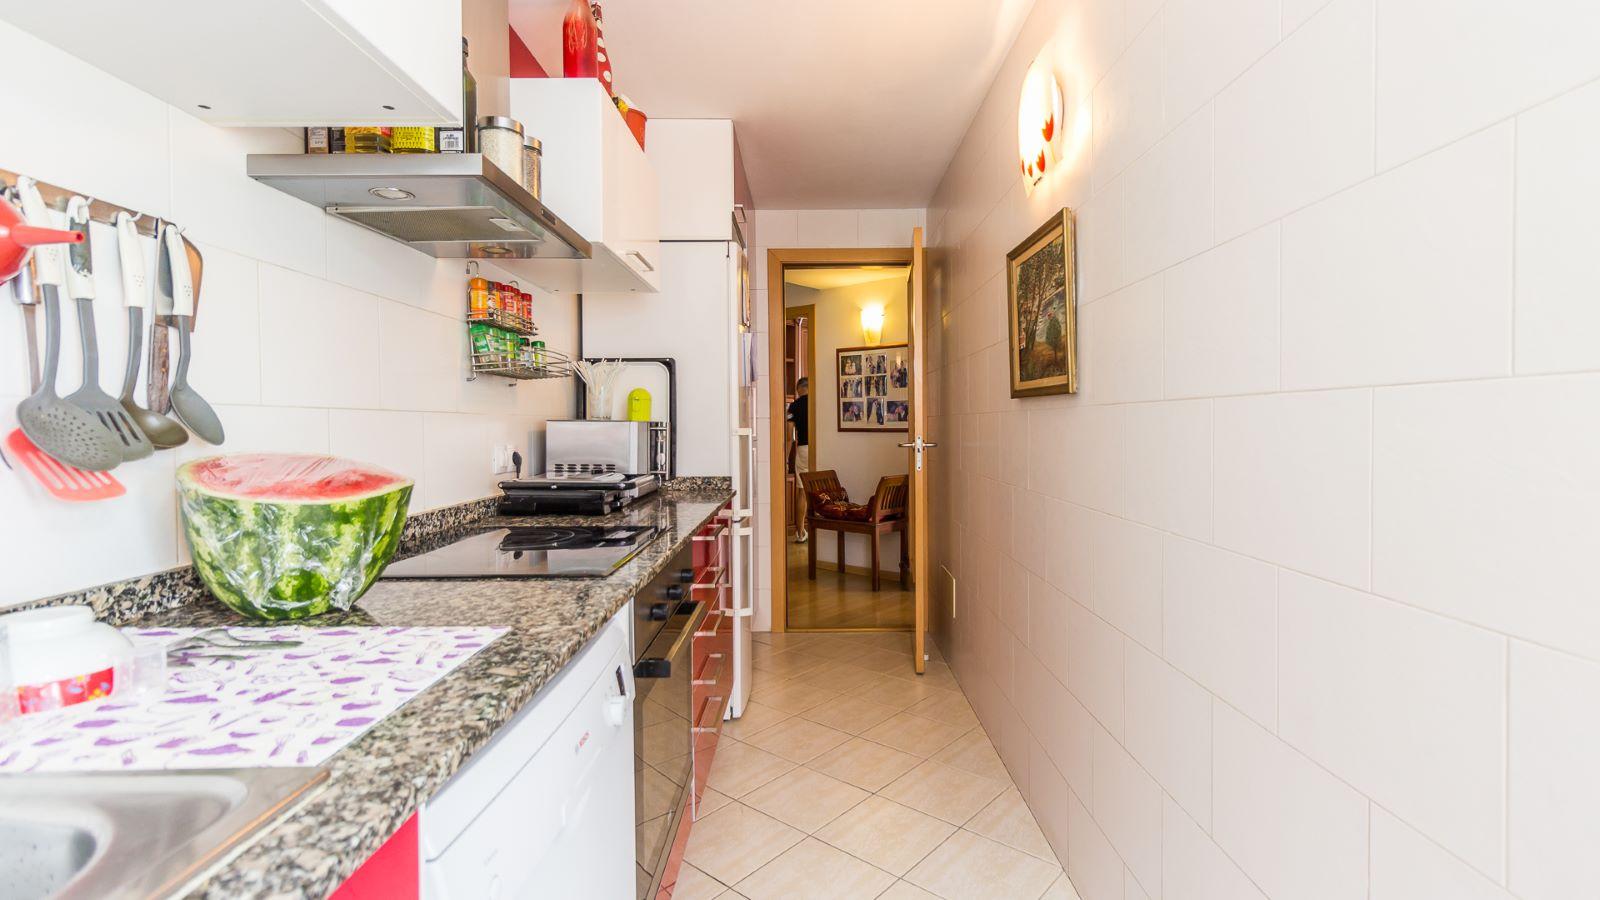 Flat in Zona Vives Llull Ref: HM2359 5